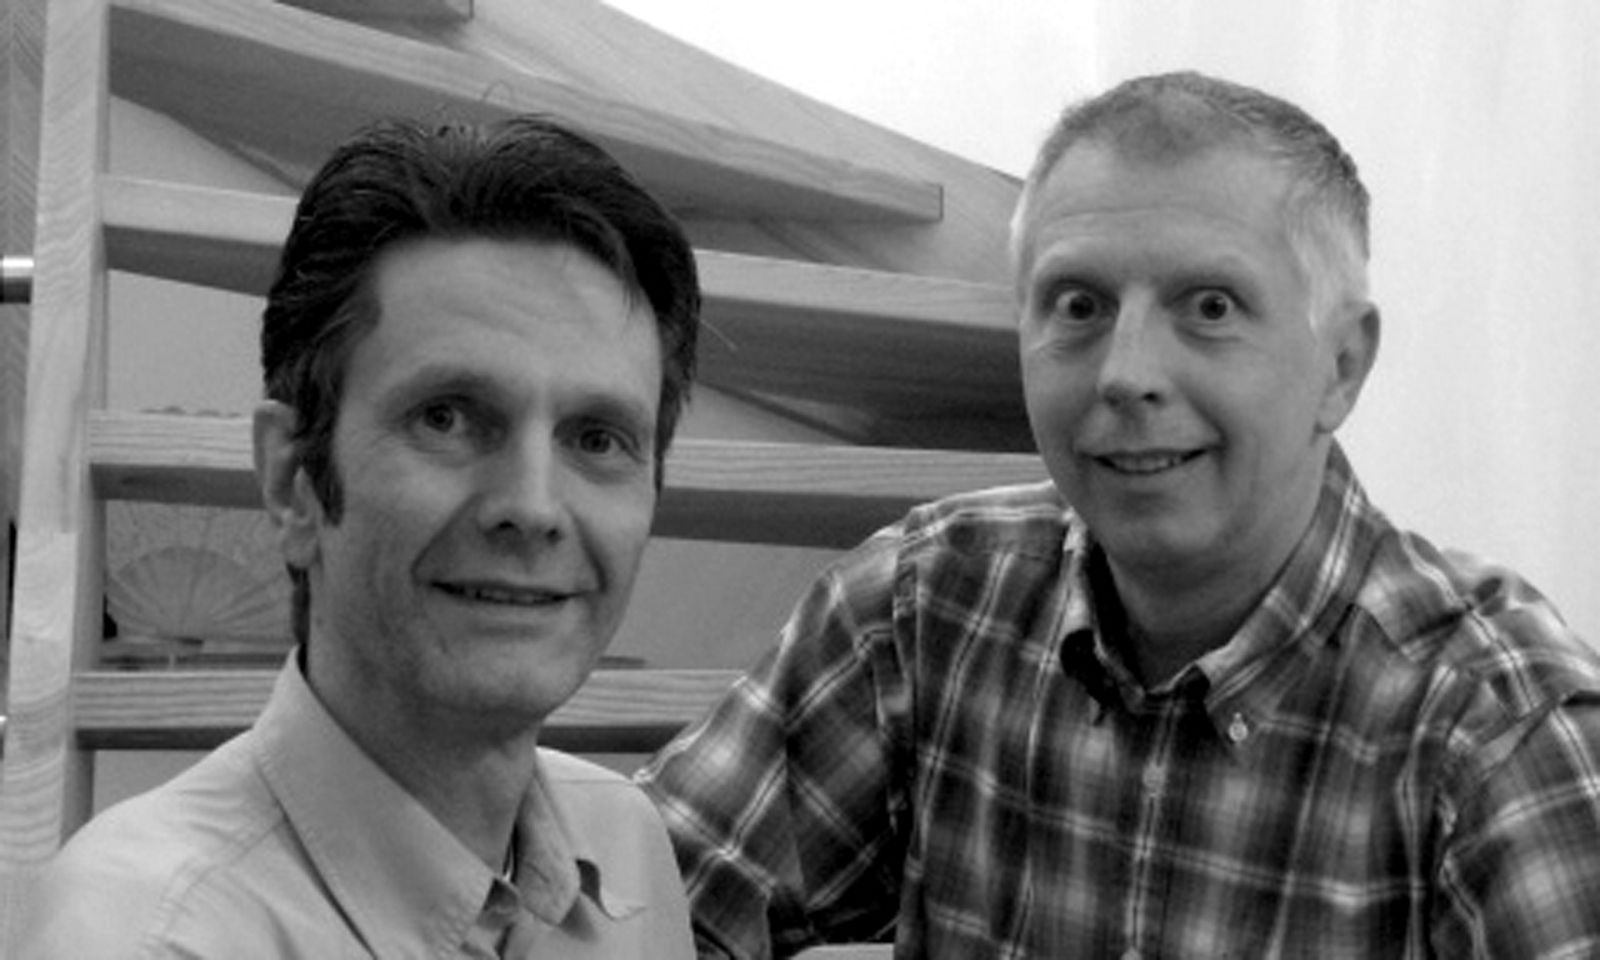 Teamarbeit. Norbert Tlusti und Geschäftspartner Peter Šramek.